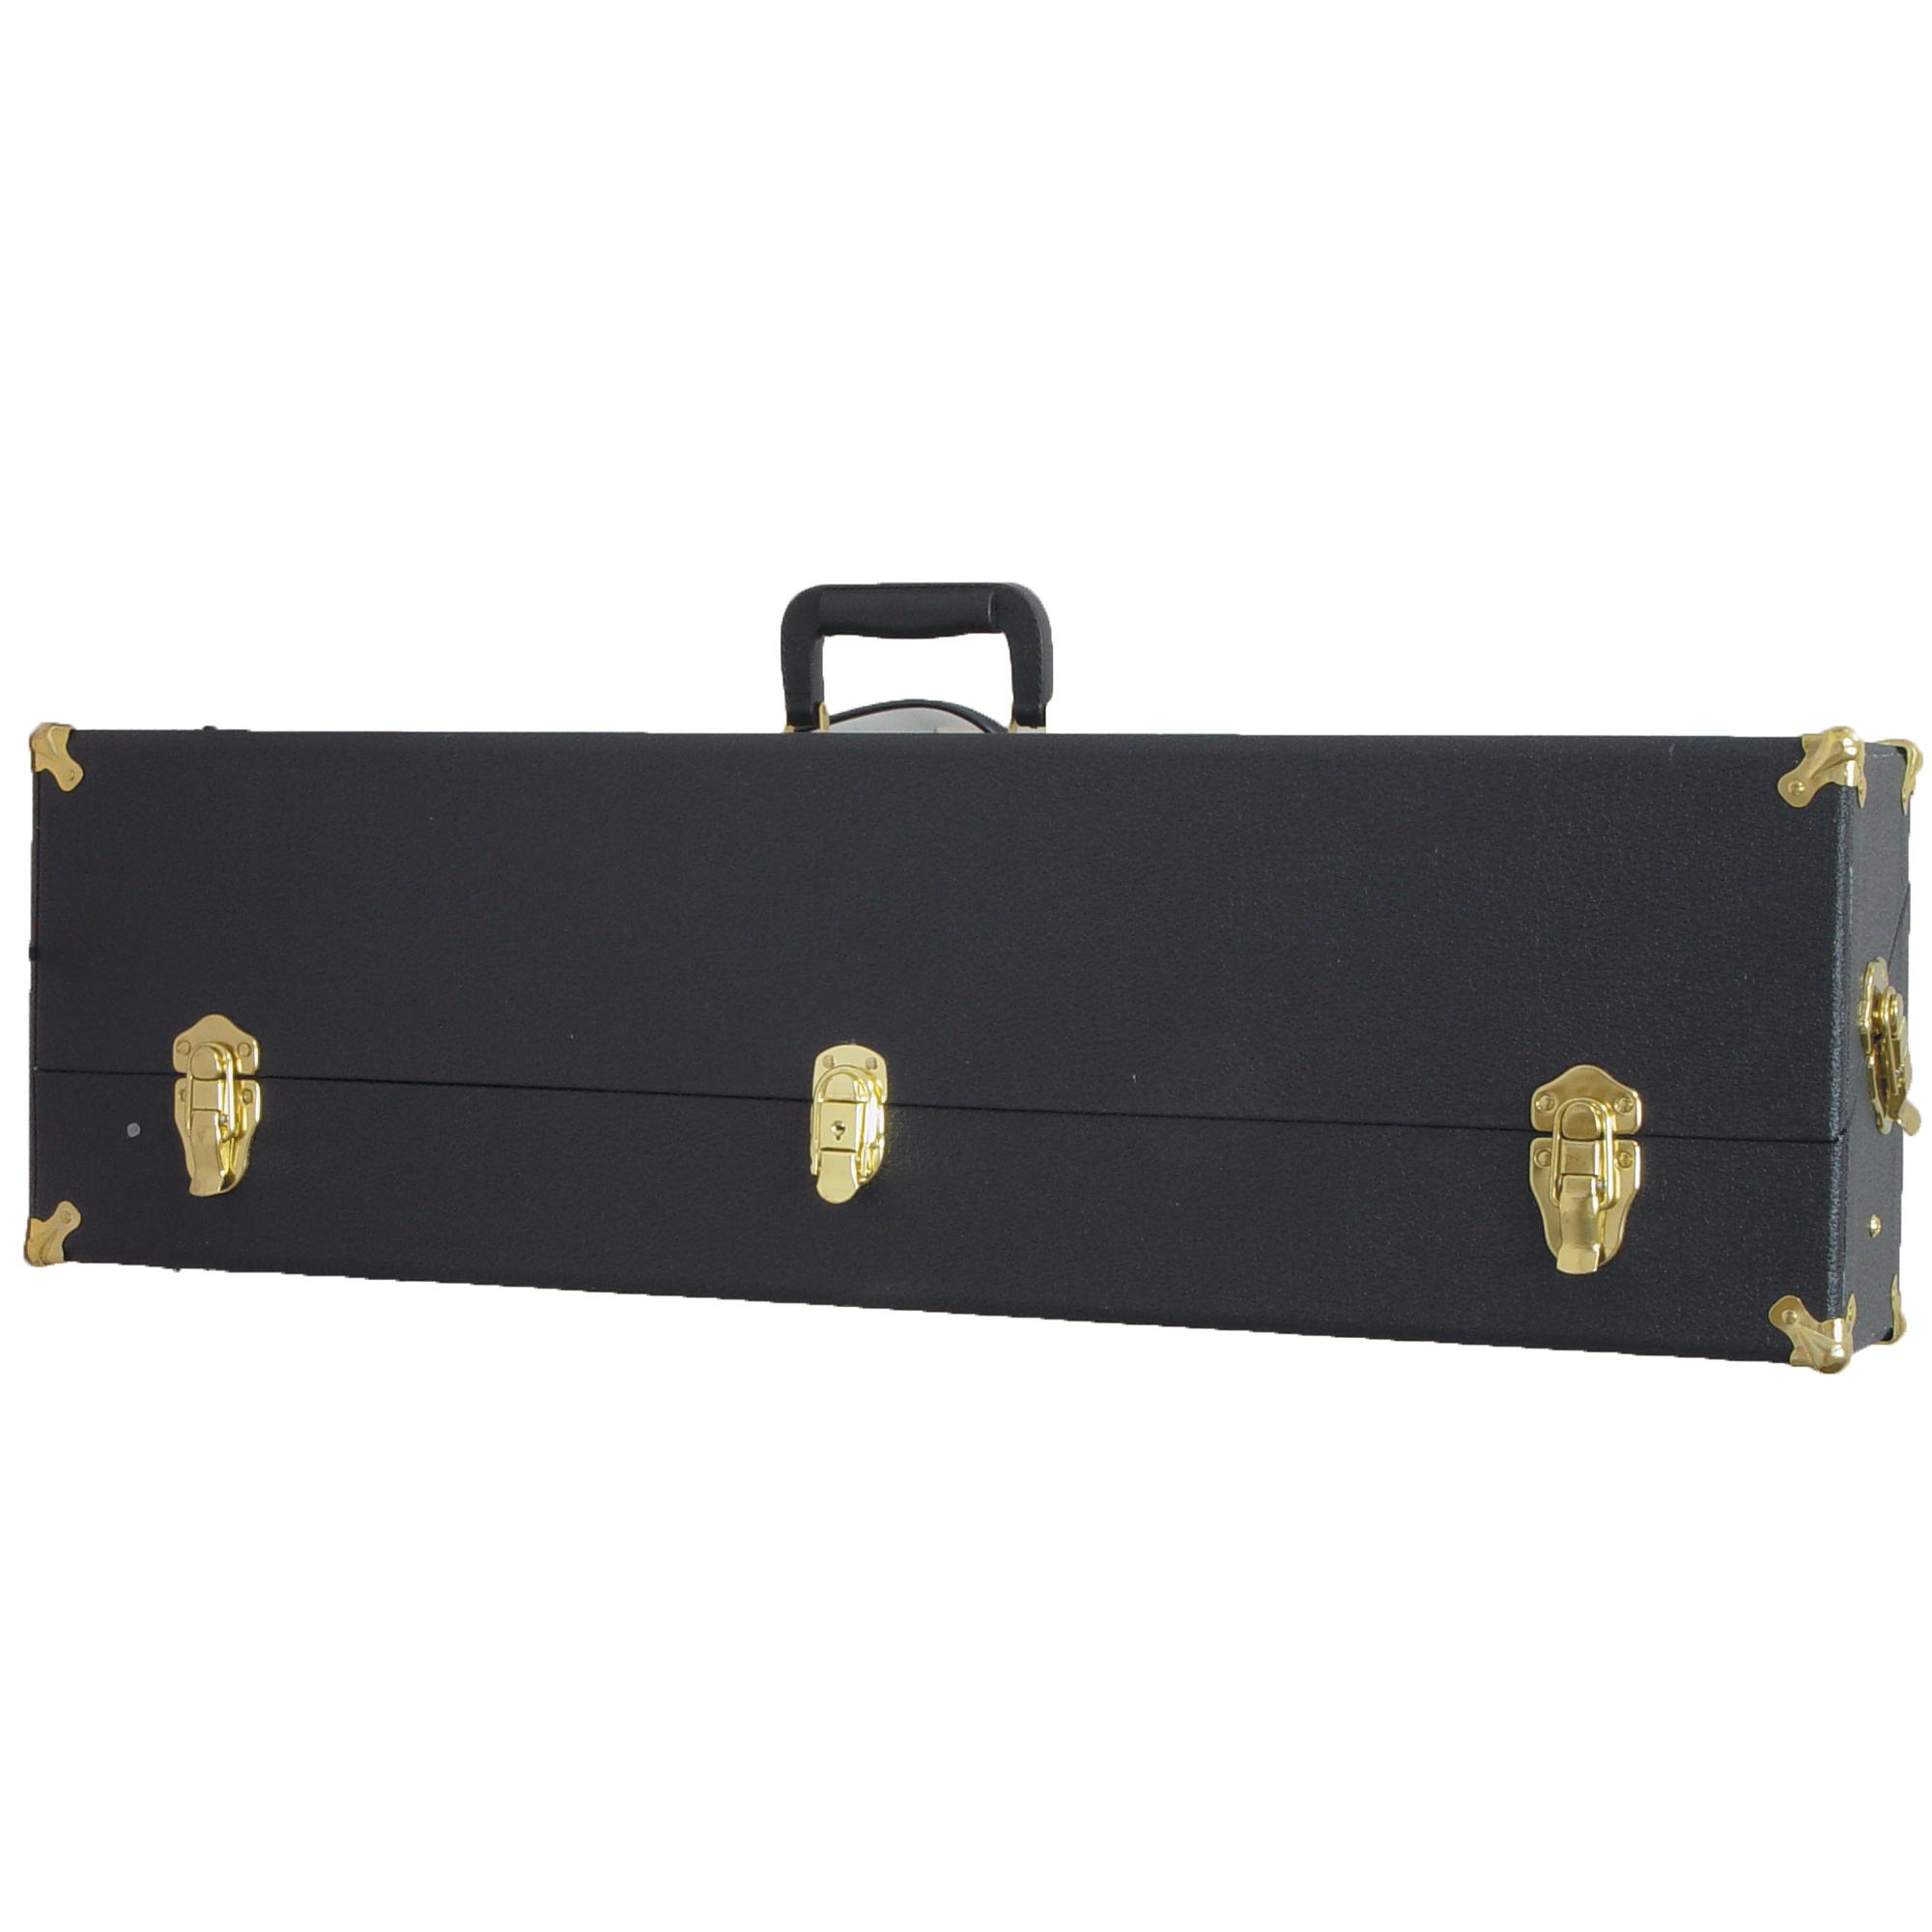 Auto Ord Thompson Fbi Hardcase